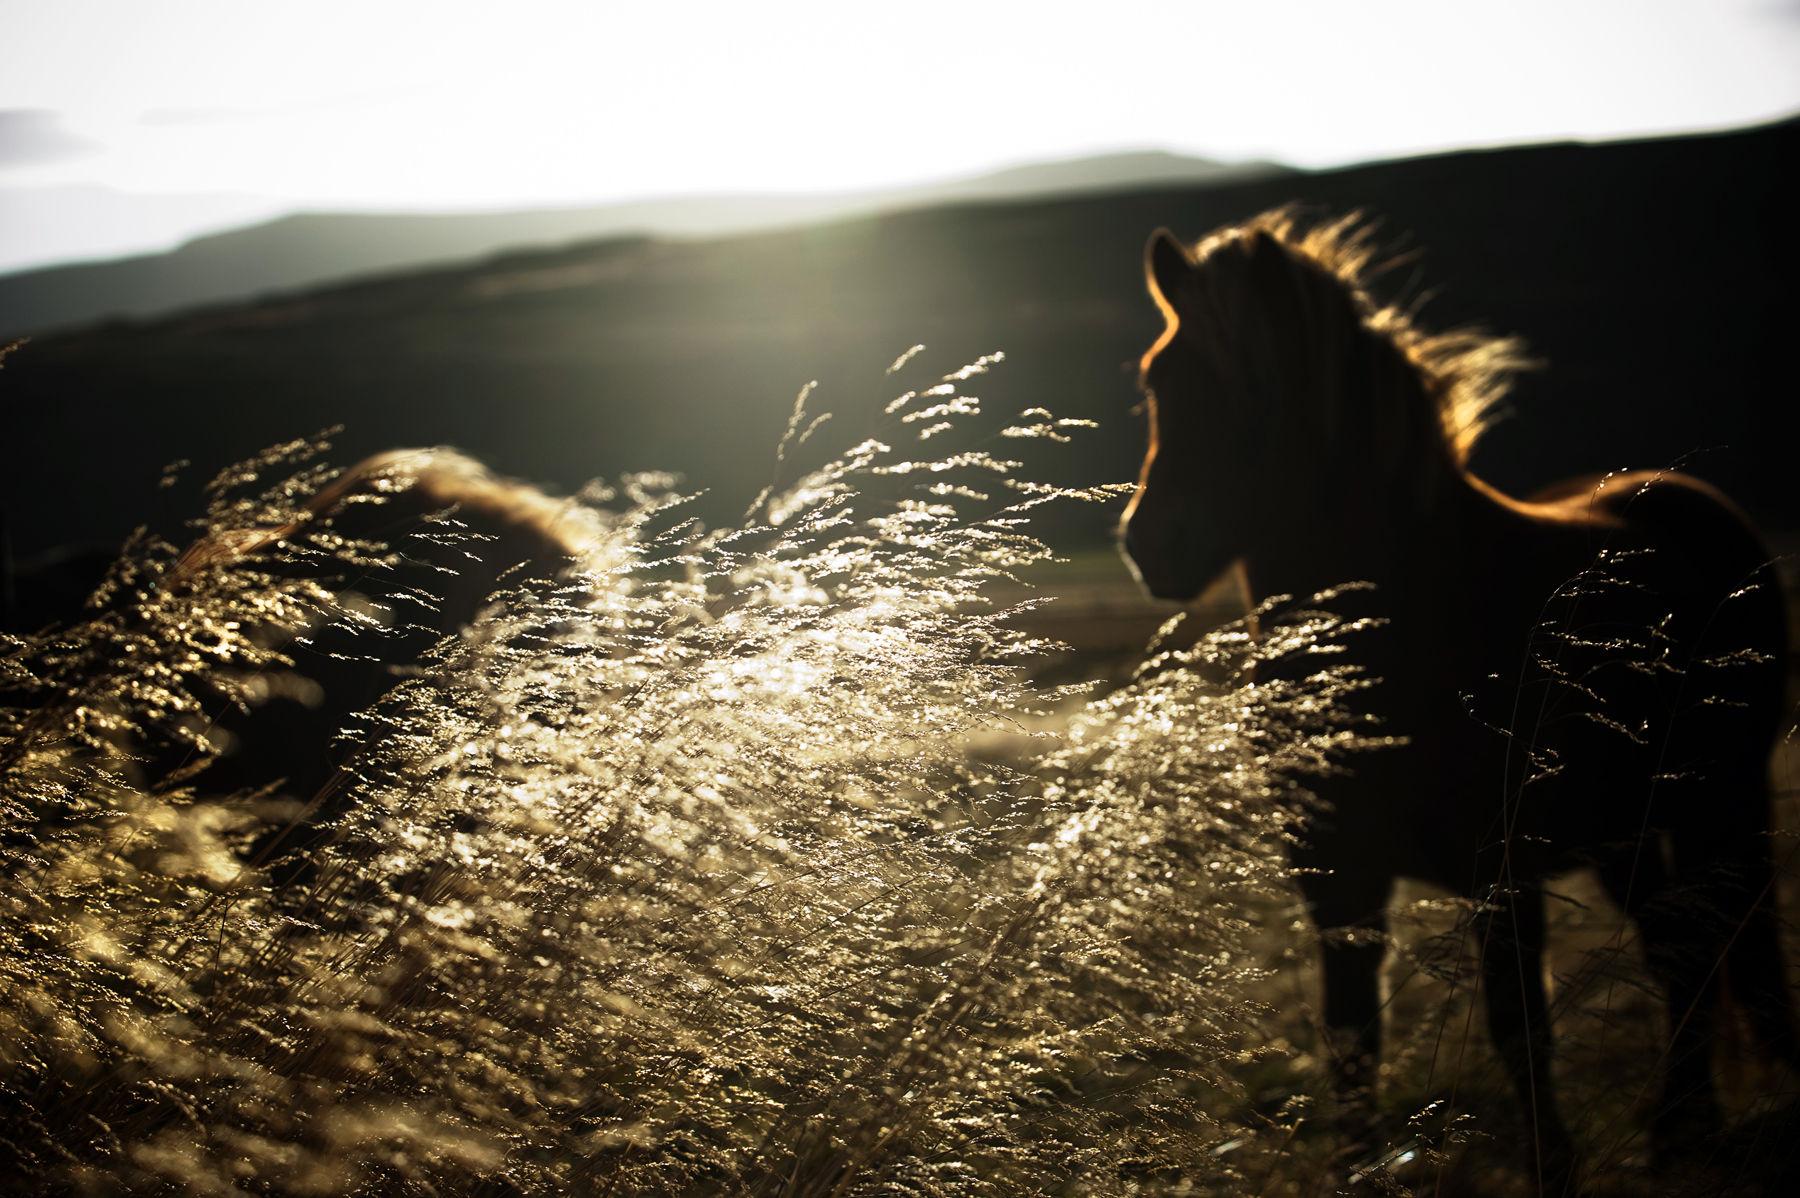 An Icelandic horse in the landscape near Thingeyrar Farm in Iceland on September 27, 2010.